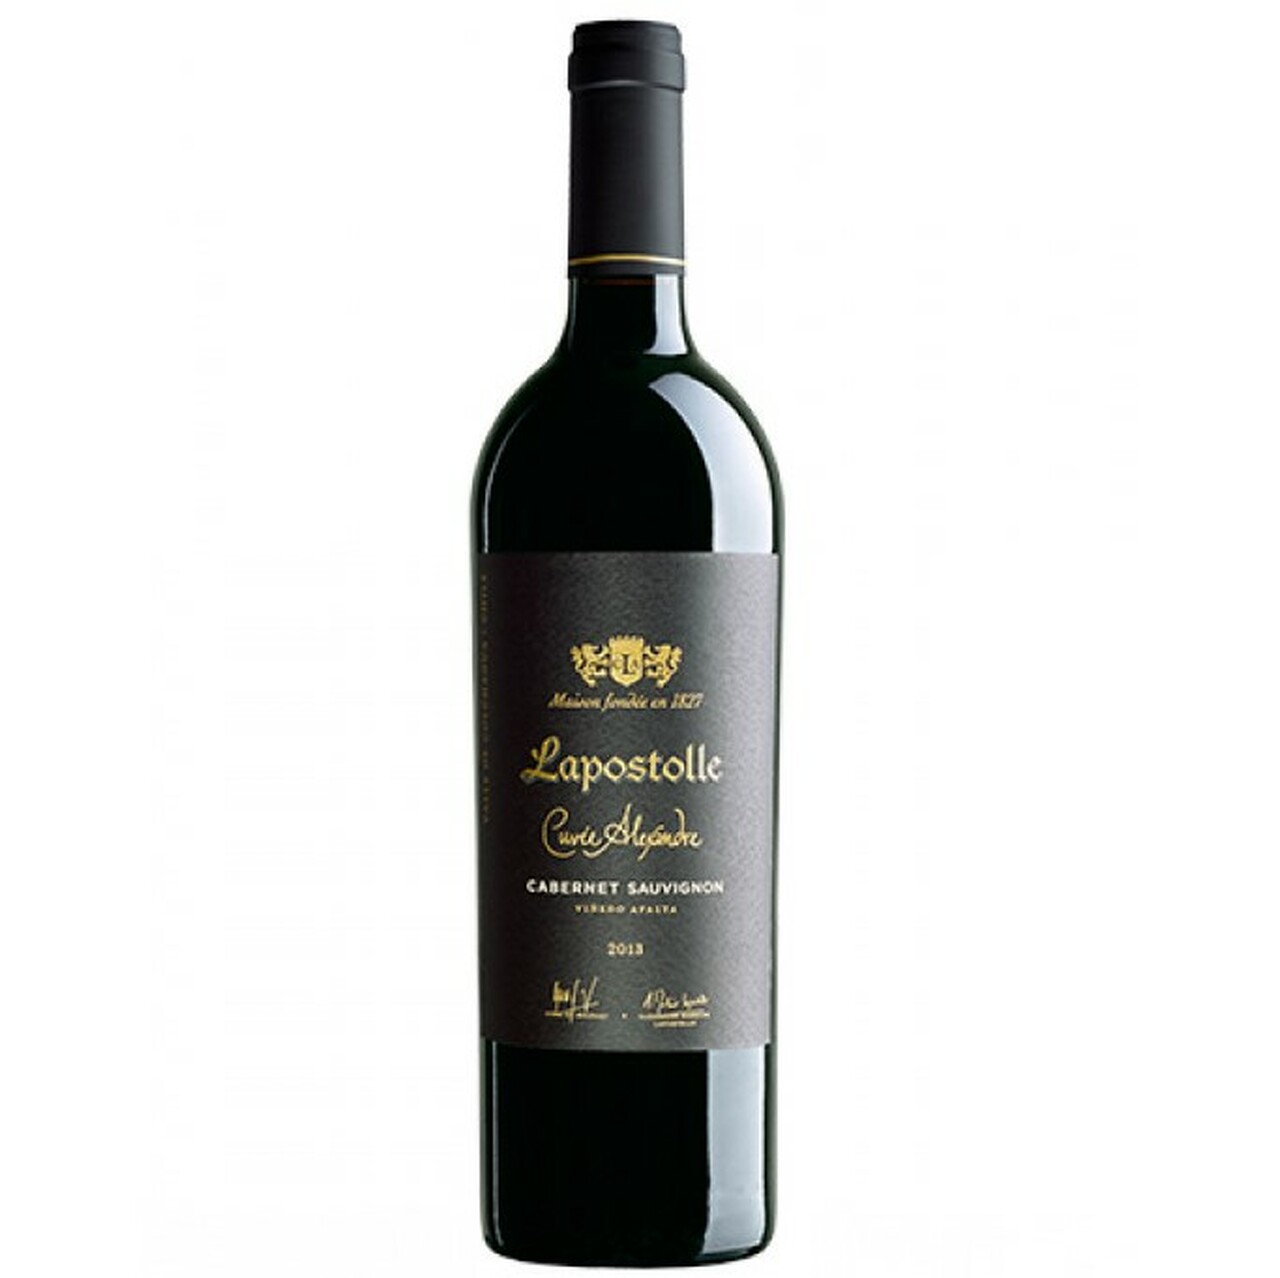 Lapostolle Cuvee Alexandre Cabernet Sauvignon Black Label 2013